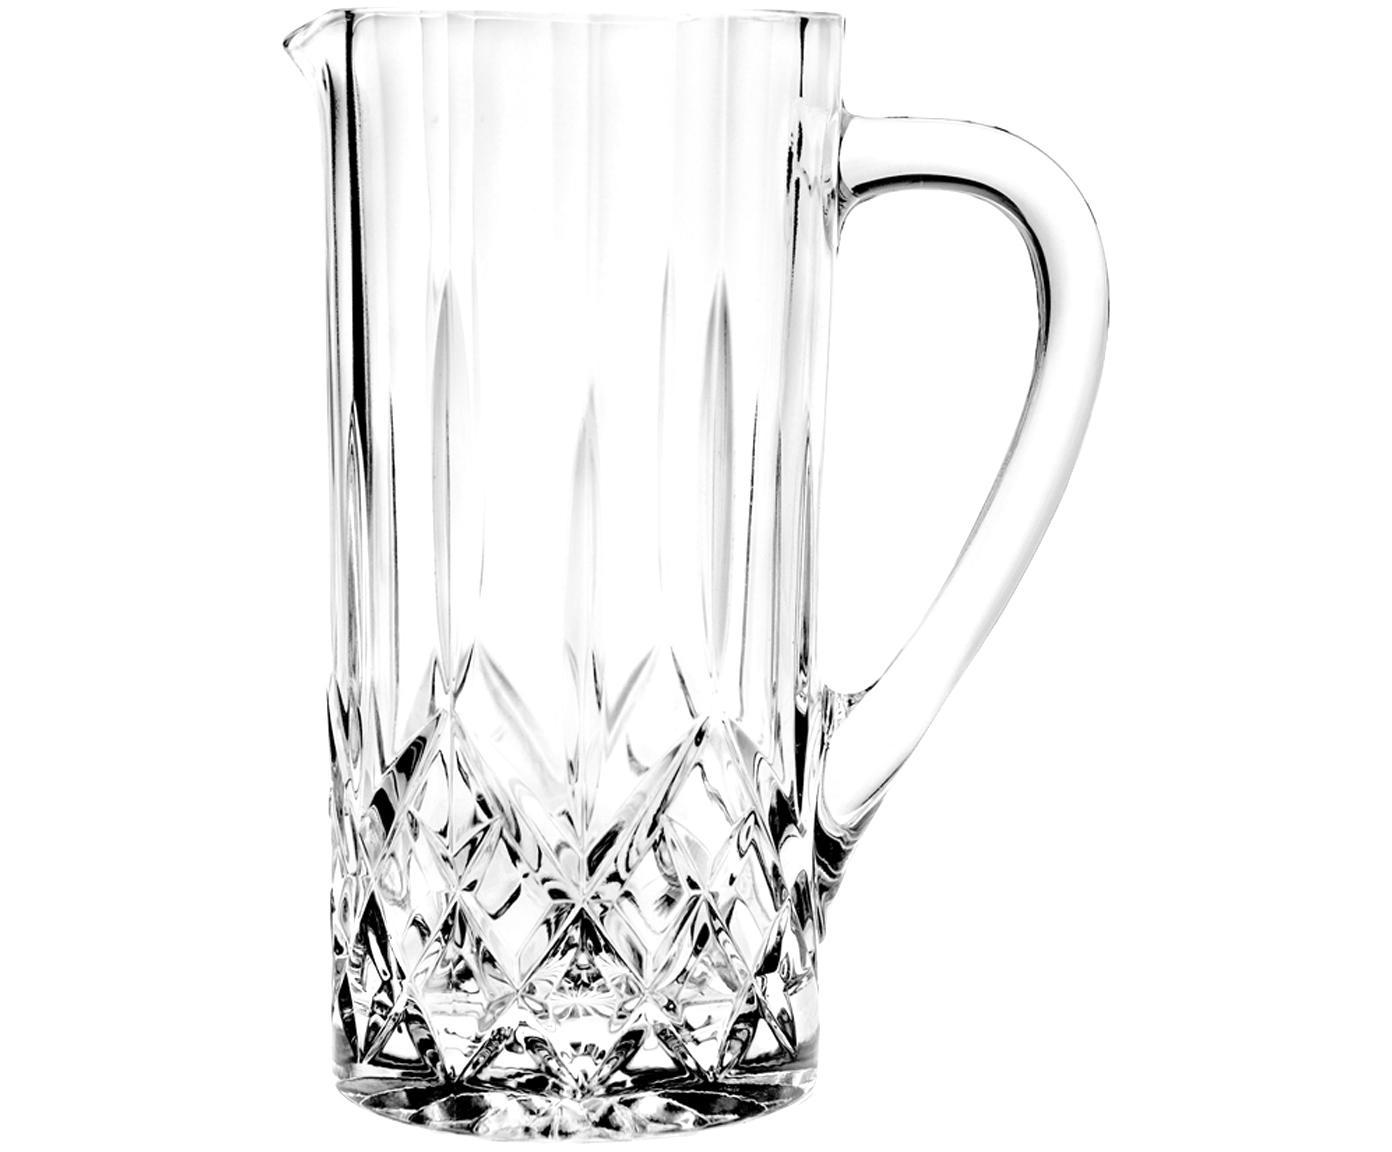 Kristallen karaf Opera, Luxion-kristalglas, Transparant, 1.2 L